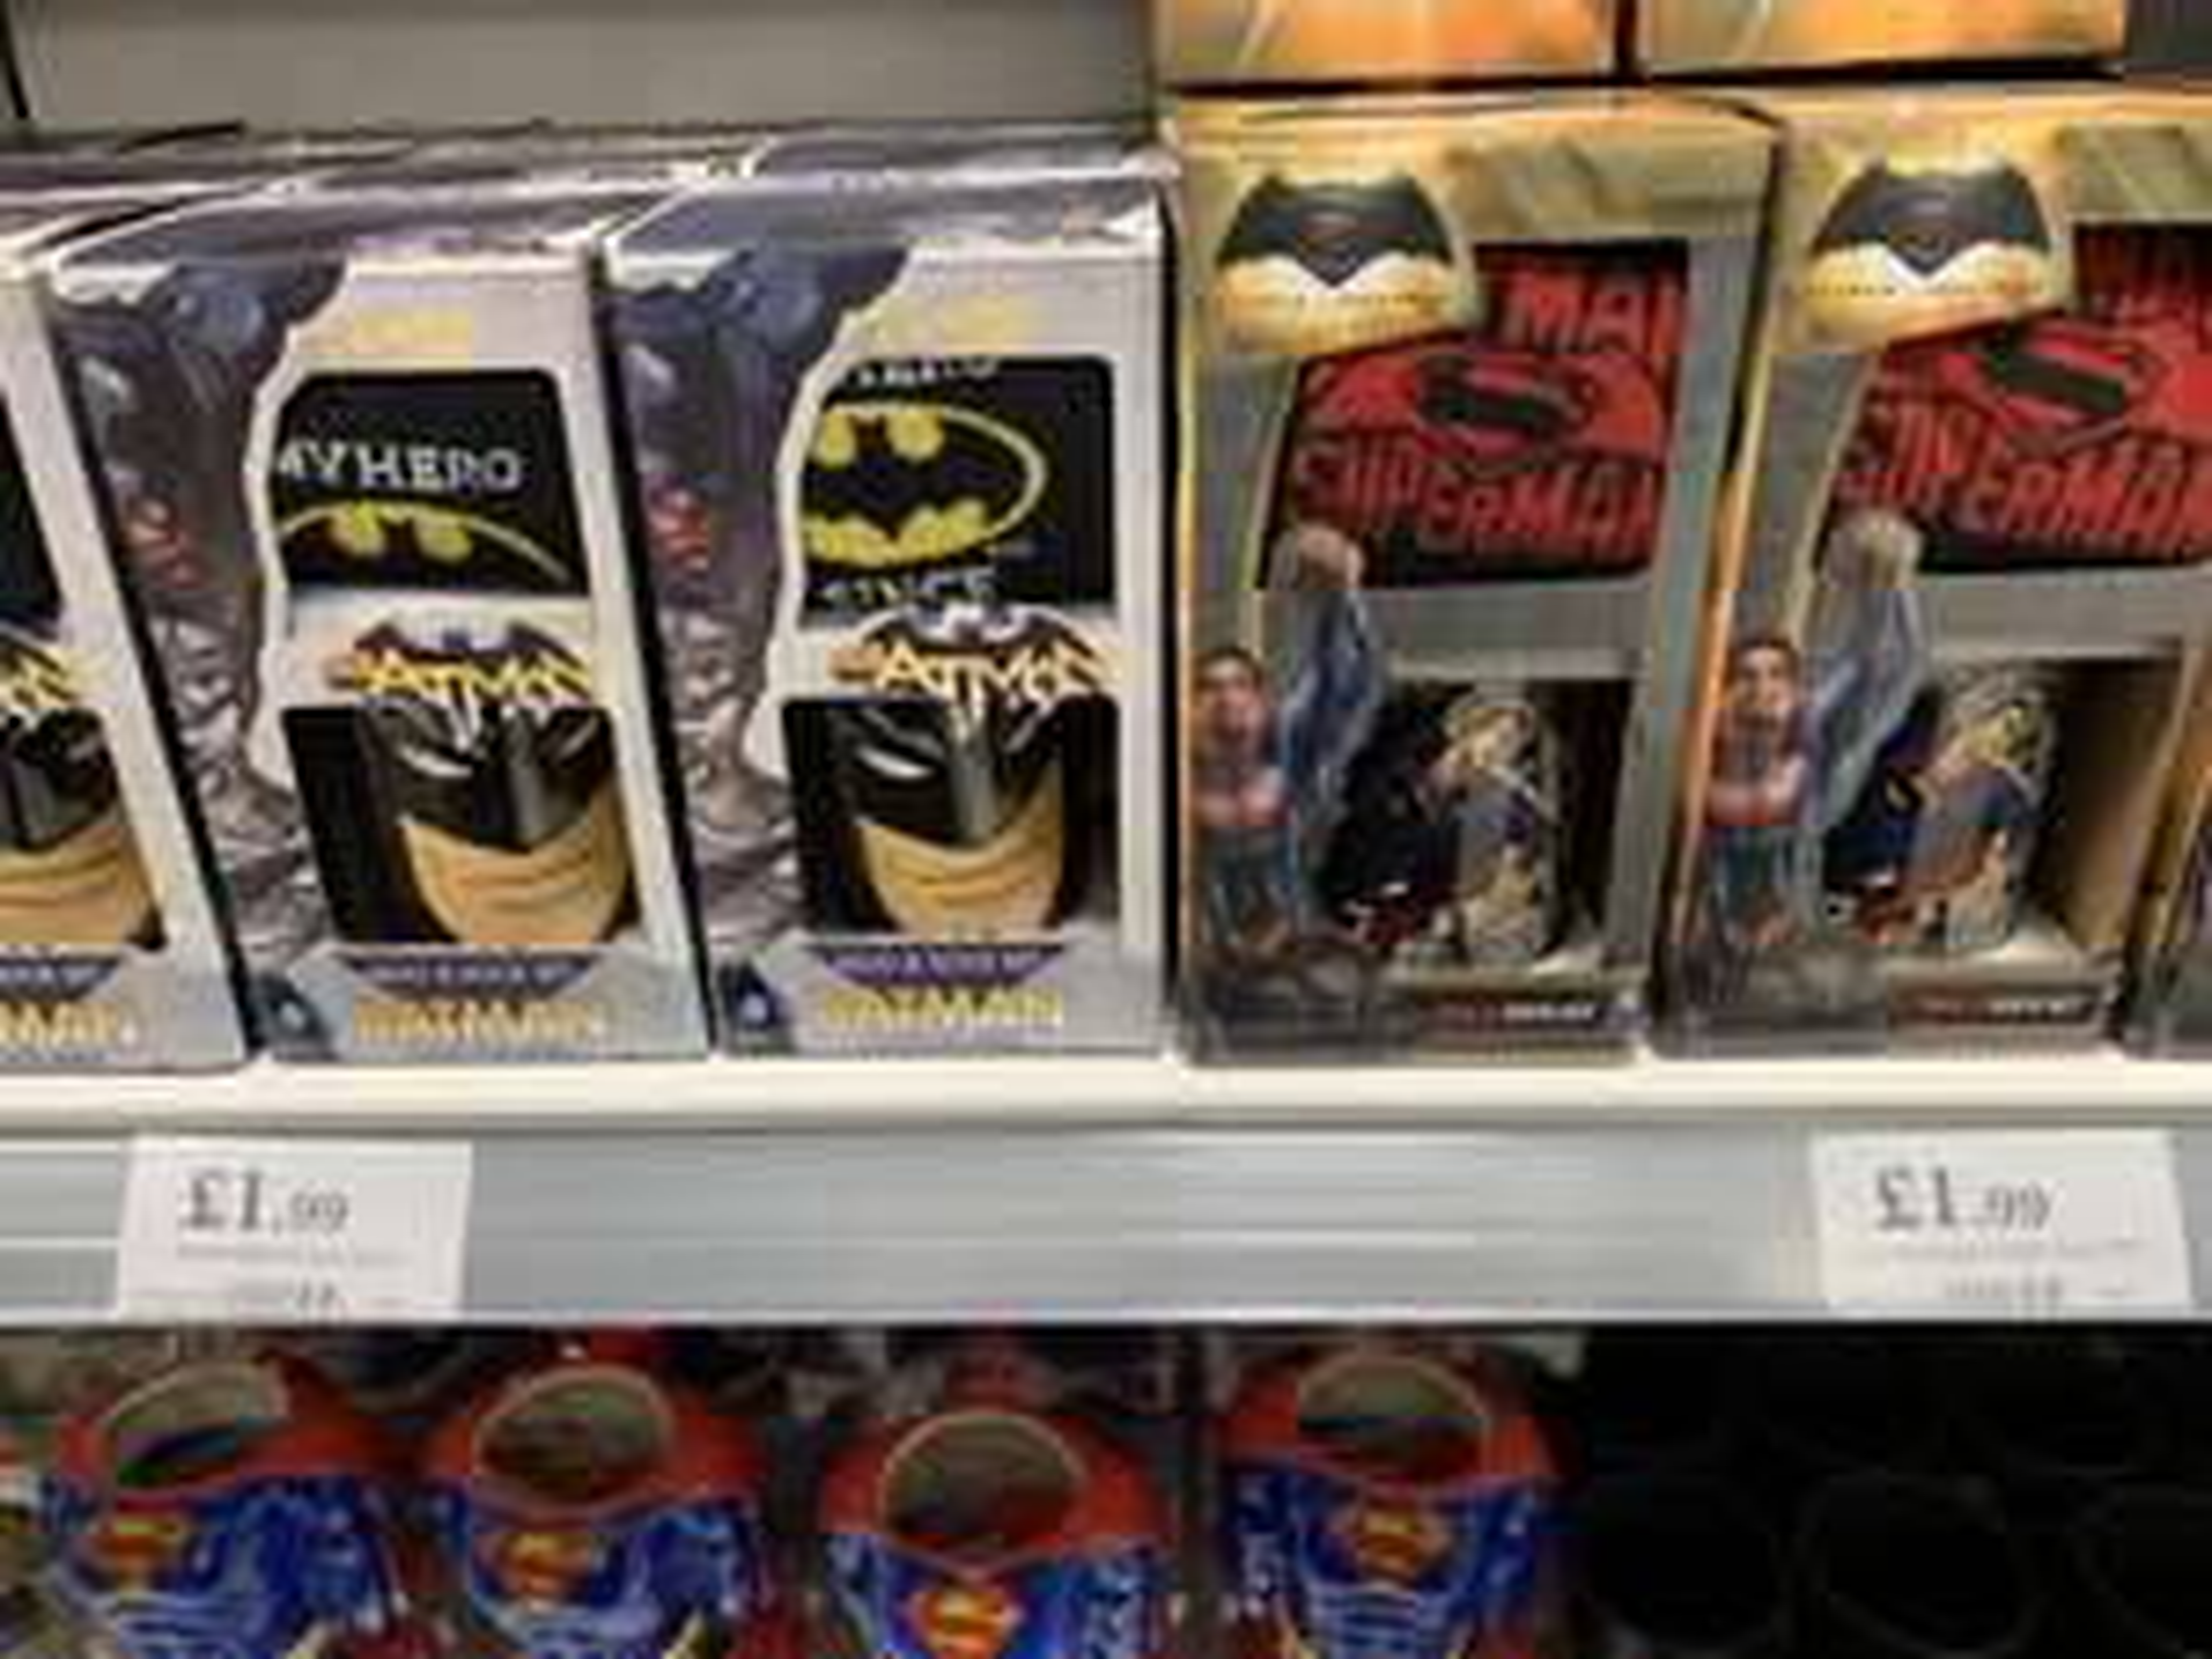 DC Mugs & socks gift set Batman superman - £1.99 Home Bargains (Harborne)